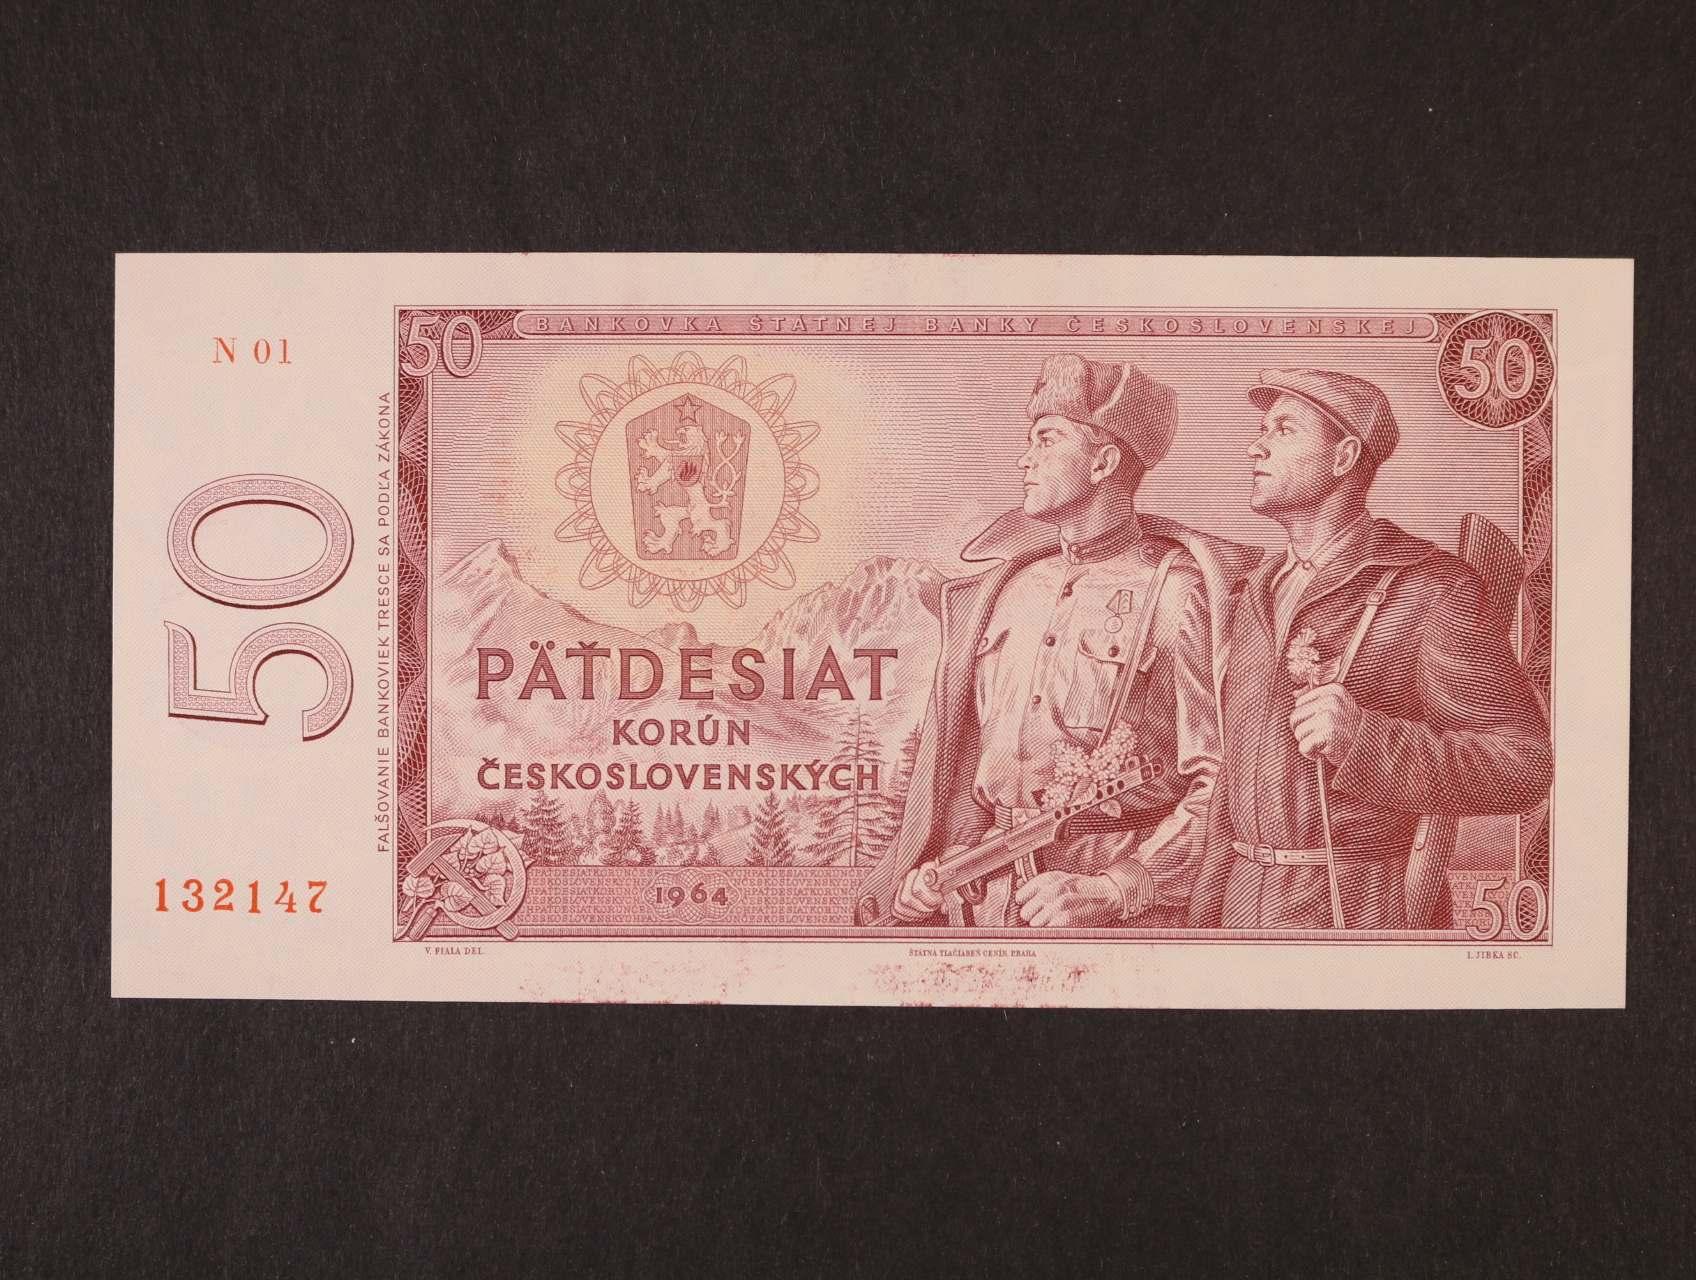 50 Kčs 1964 série N 01, Ba, 99b2, Pi. 90a